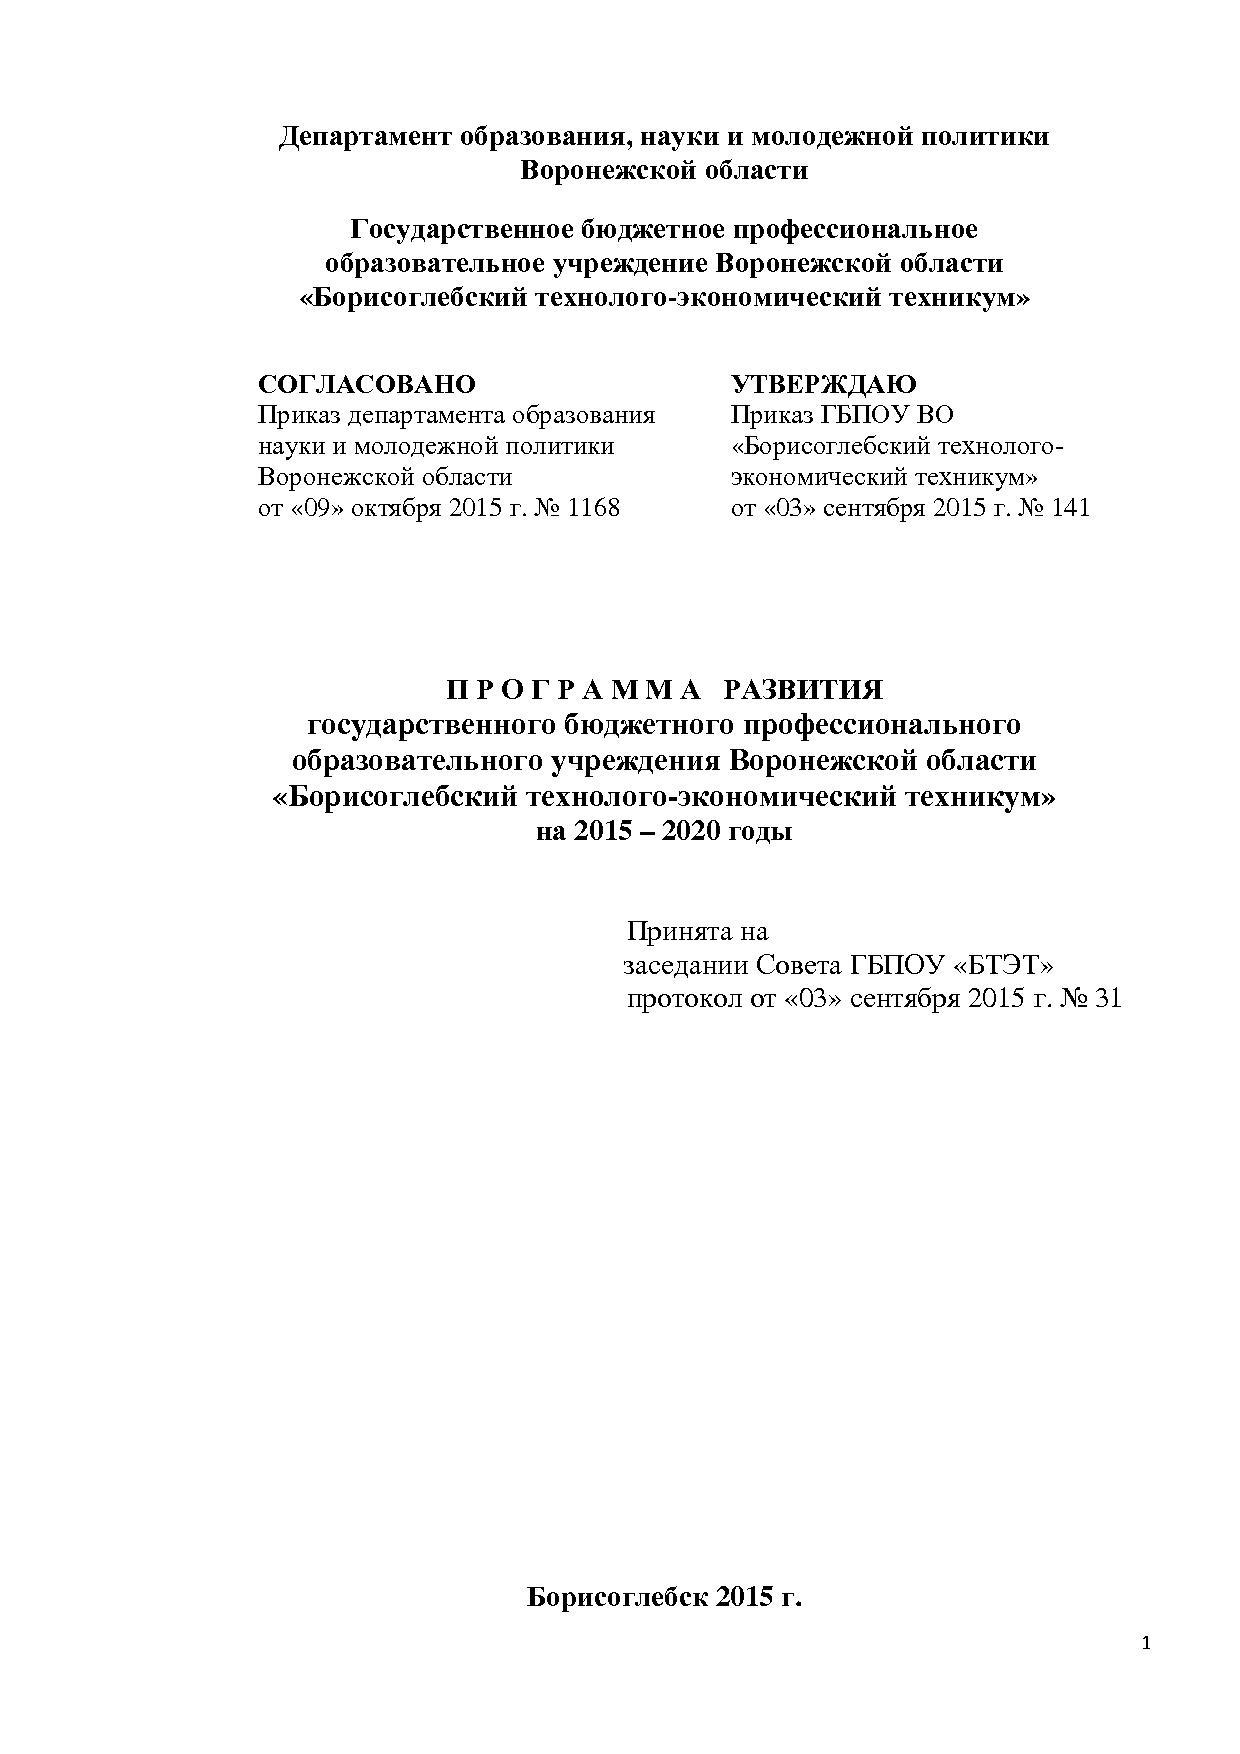 ПРОГРАММА РАЗВИТИЯ 2015-2020